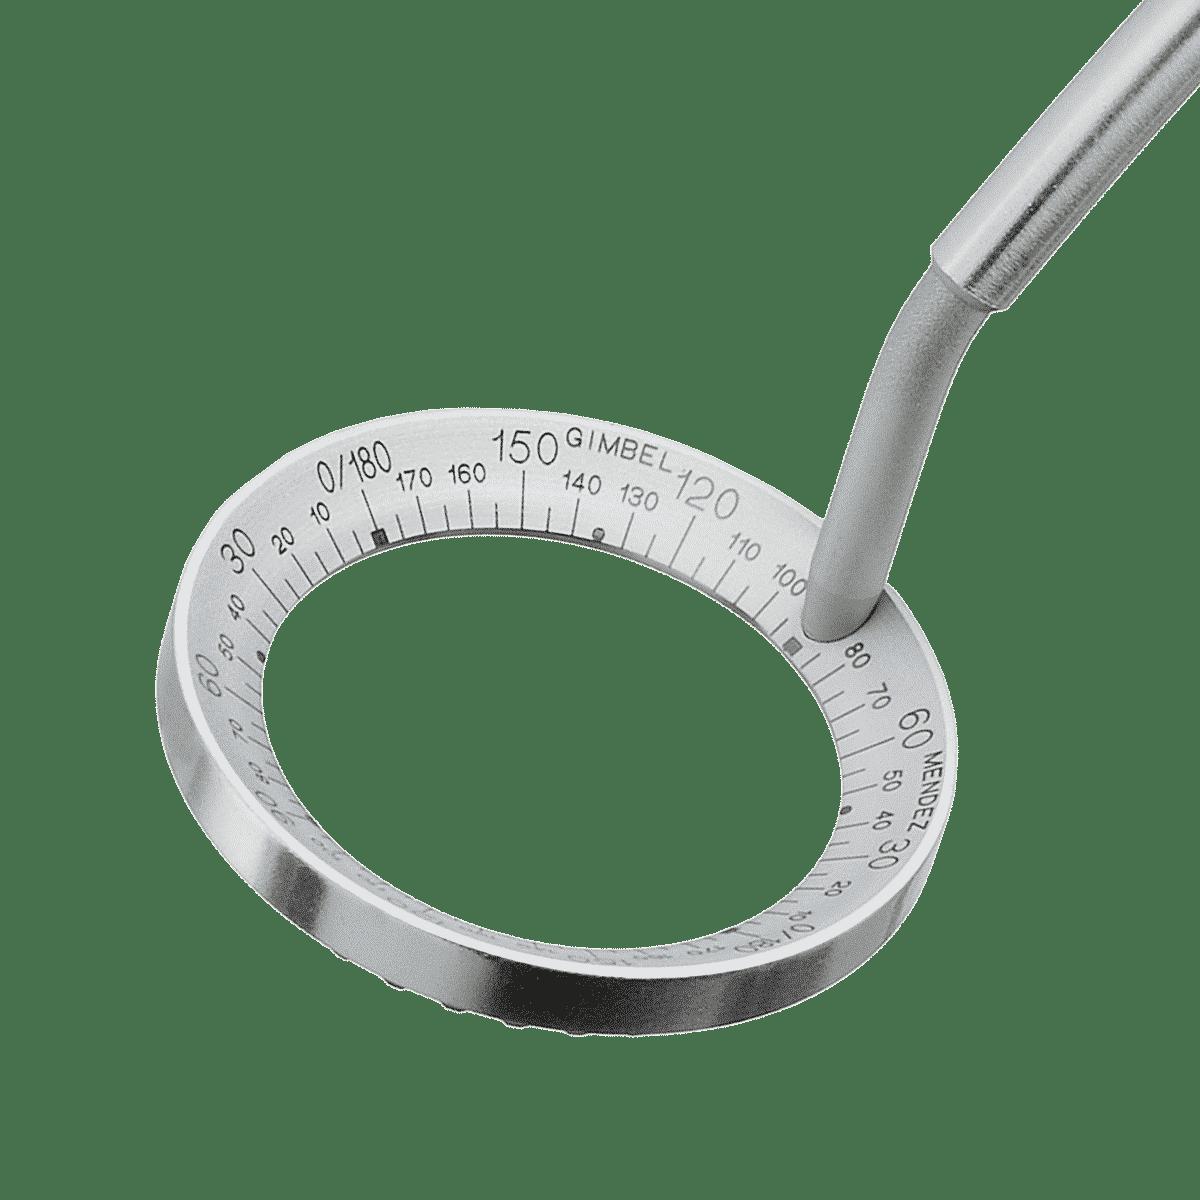 Gimbel/Mendez Ring 90° (RFBG MG1116)